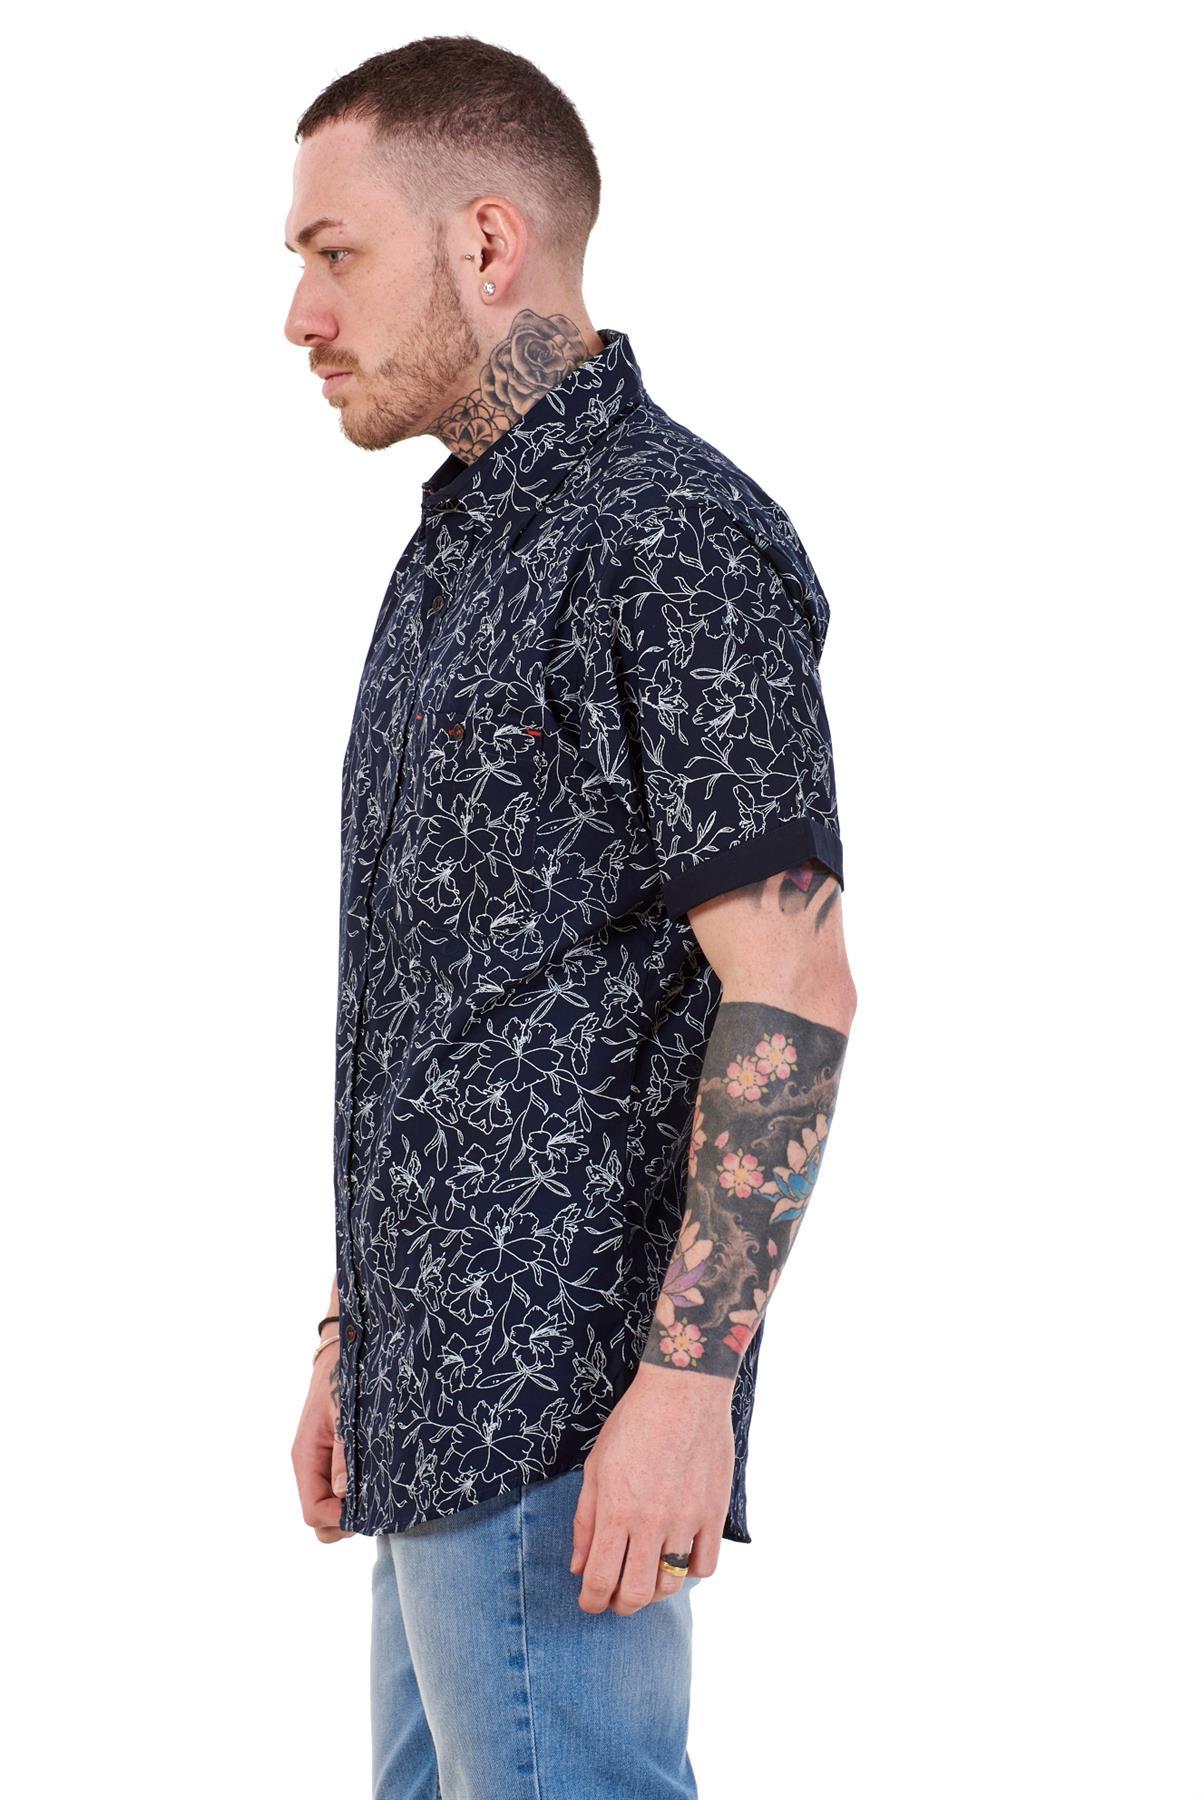 Mens-100-Cotton-Printed-Shirt-Short-Sleeve-Regular-Big-Size-Casual-Top-M-to-5XL thumbnail 14